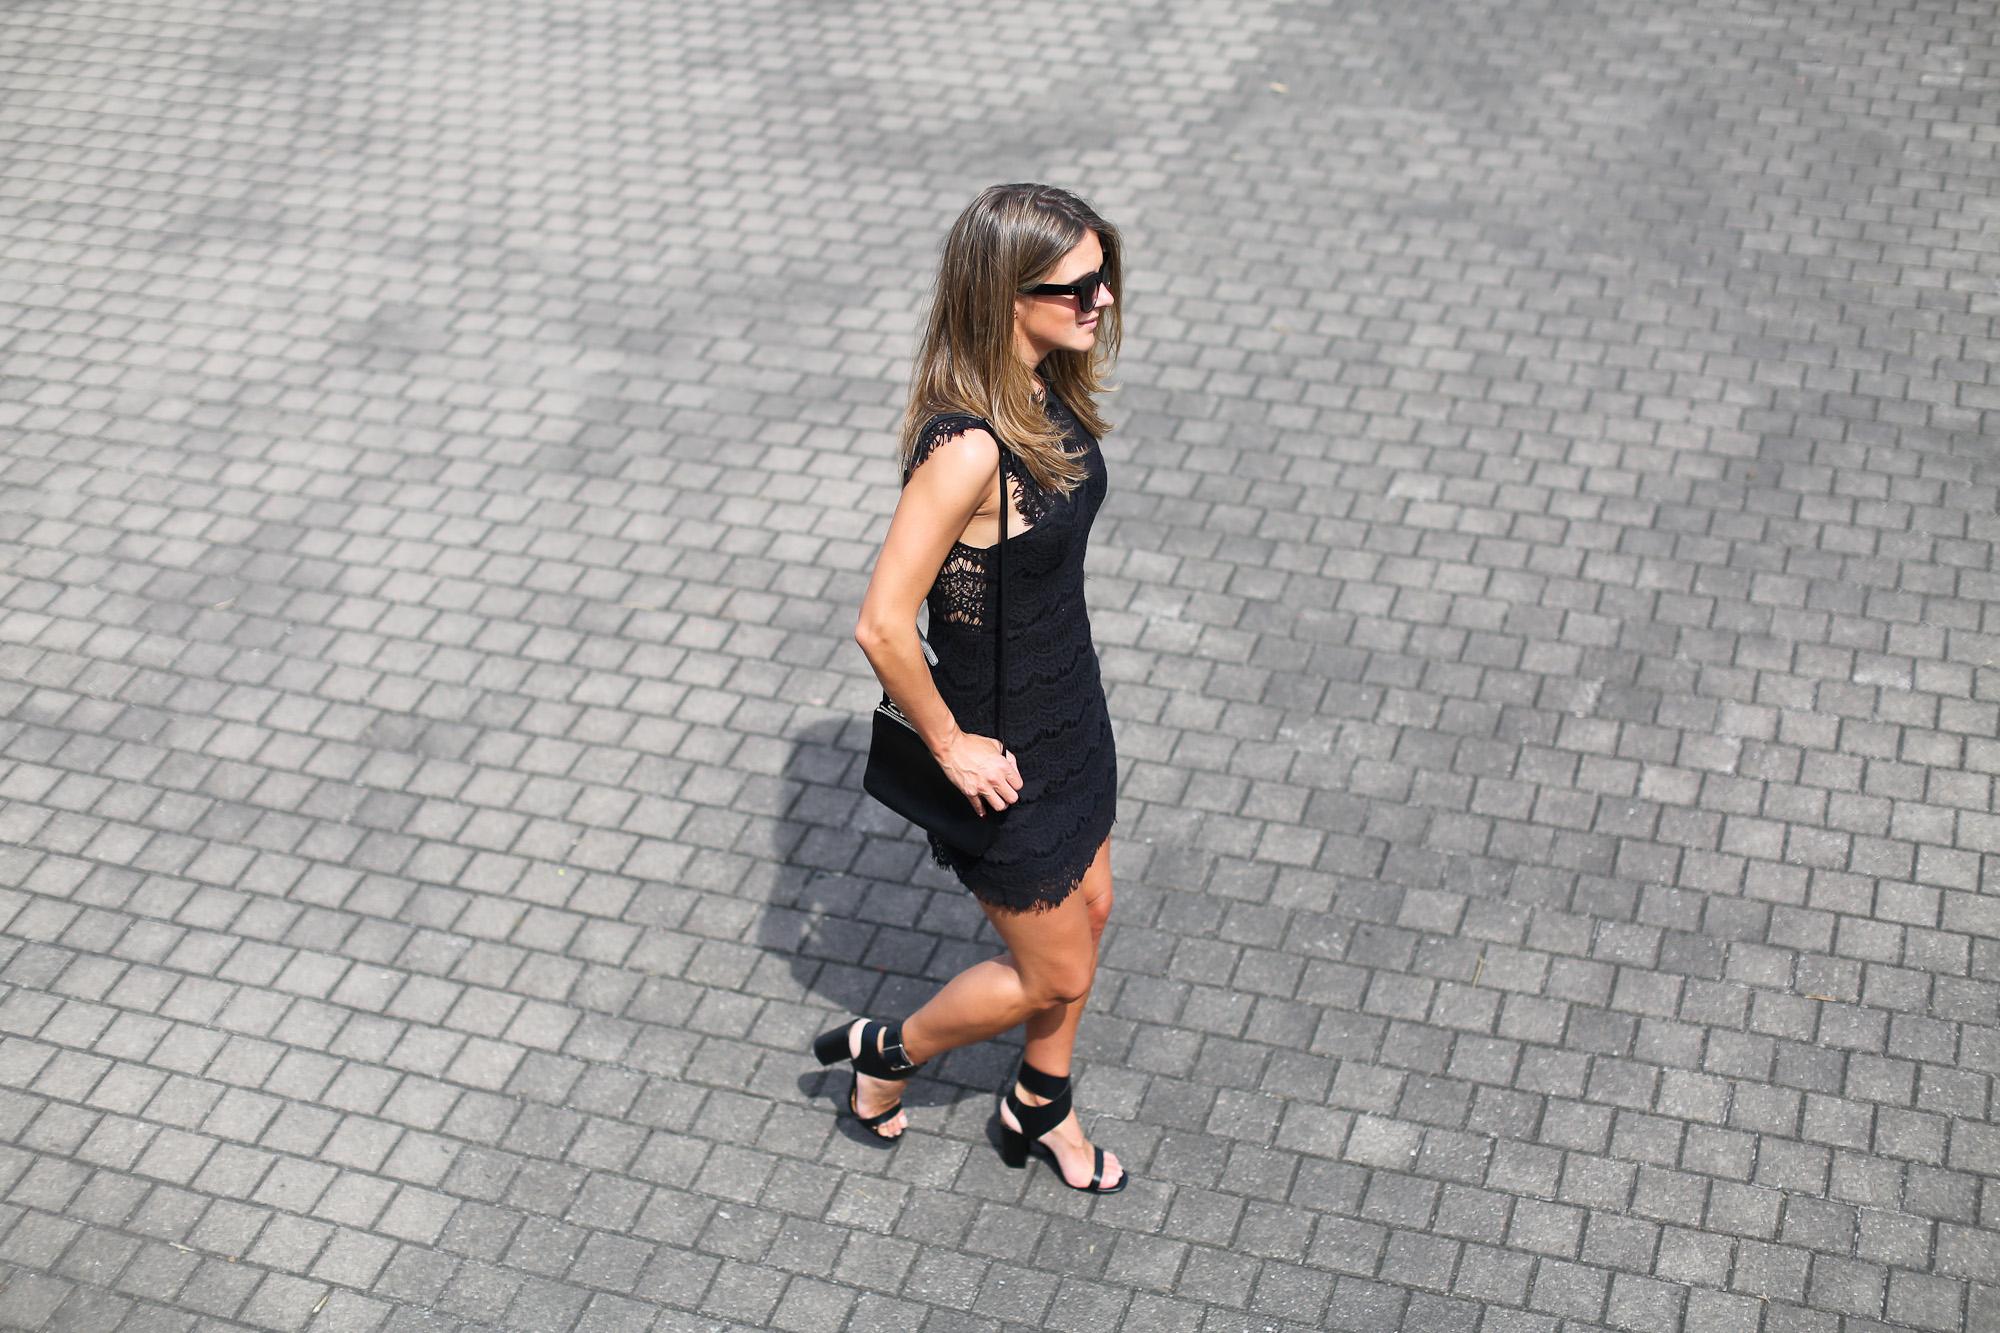 Clochet_streetstyle_tiesandheels_vestidovintagesweet_bailarinaspunteraconbrillos-4